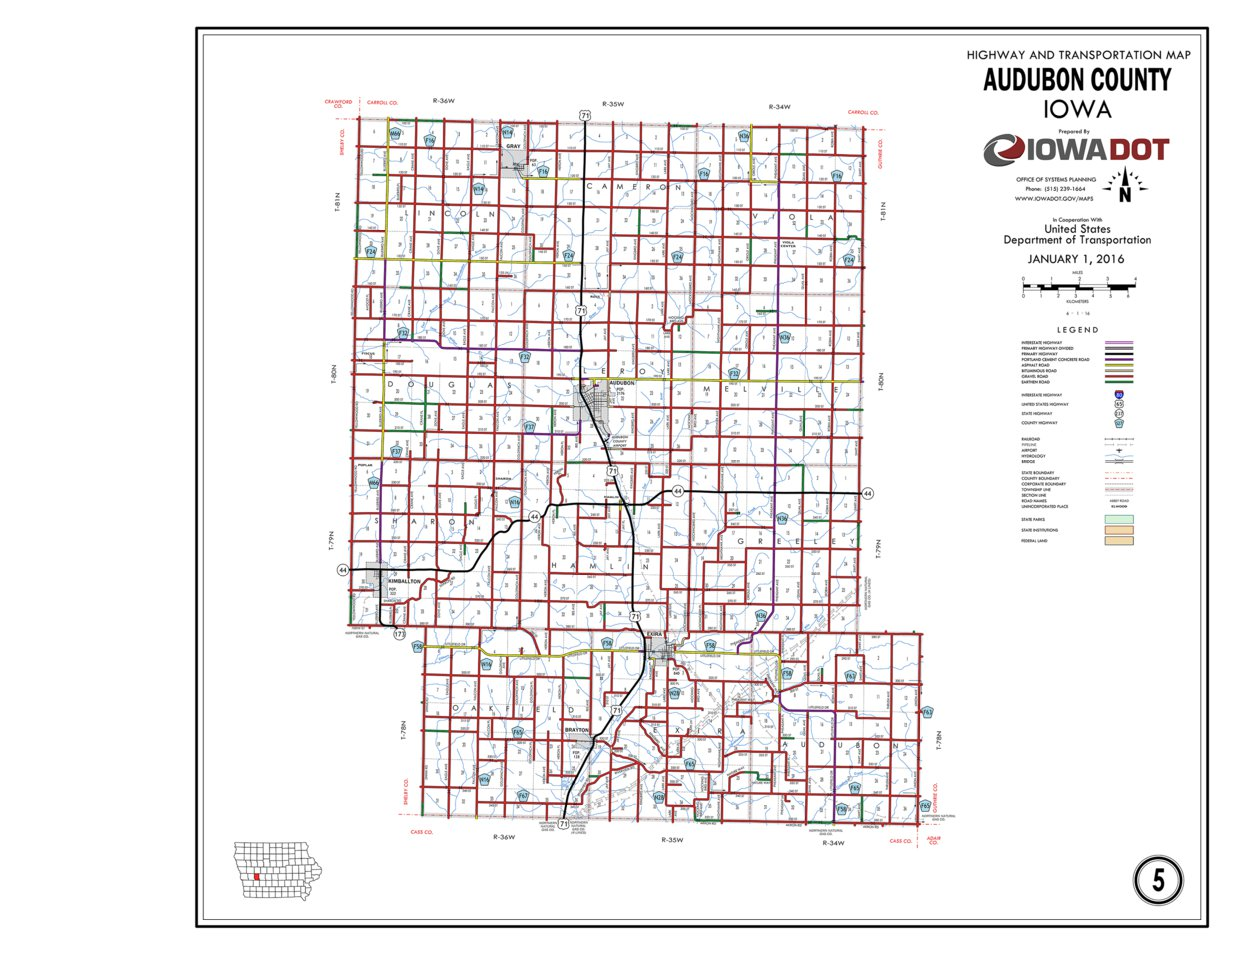 Audubon Iowa Map.Audubon County Iowa Iowa Department Of Transportation Avenza Maps